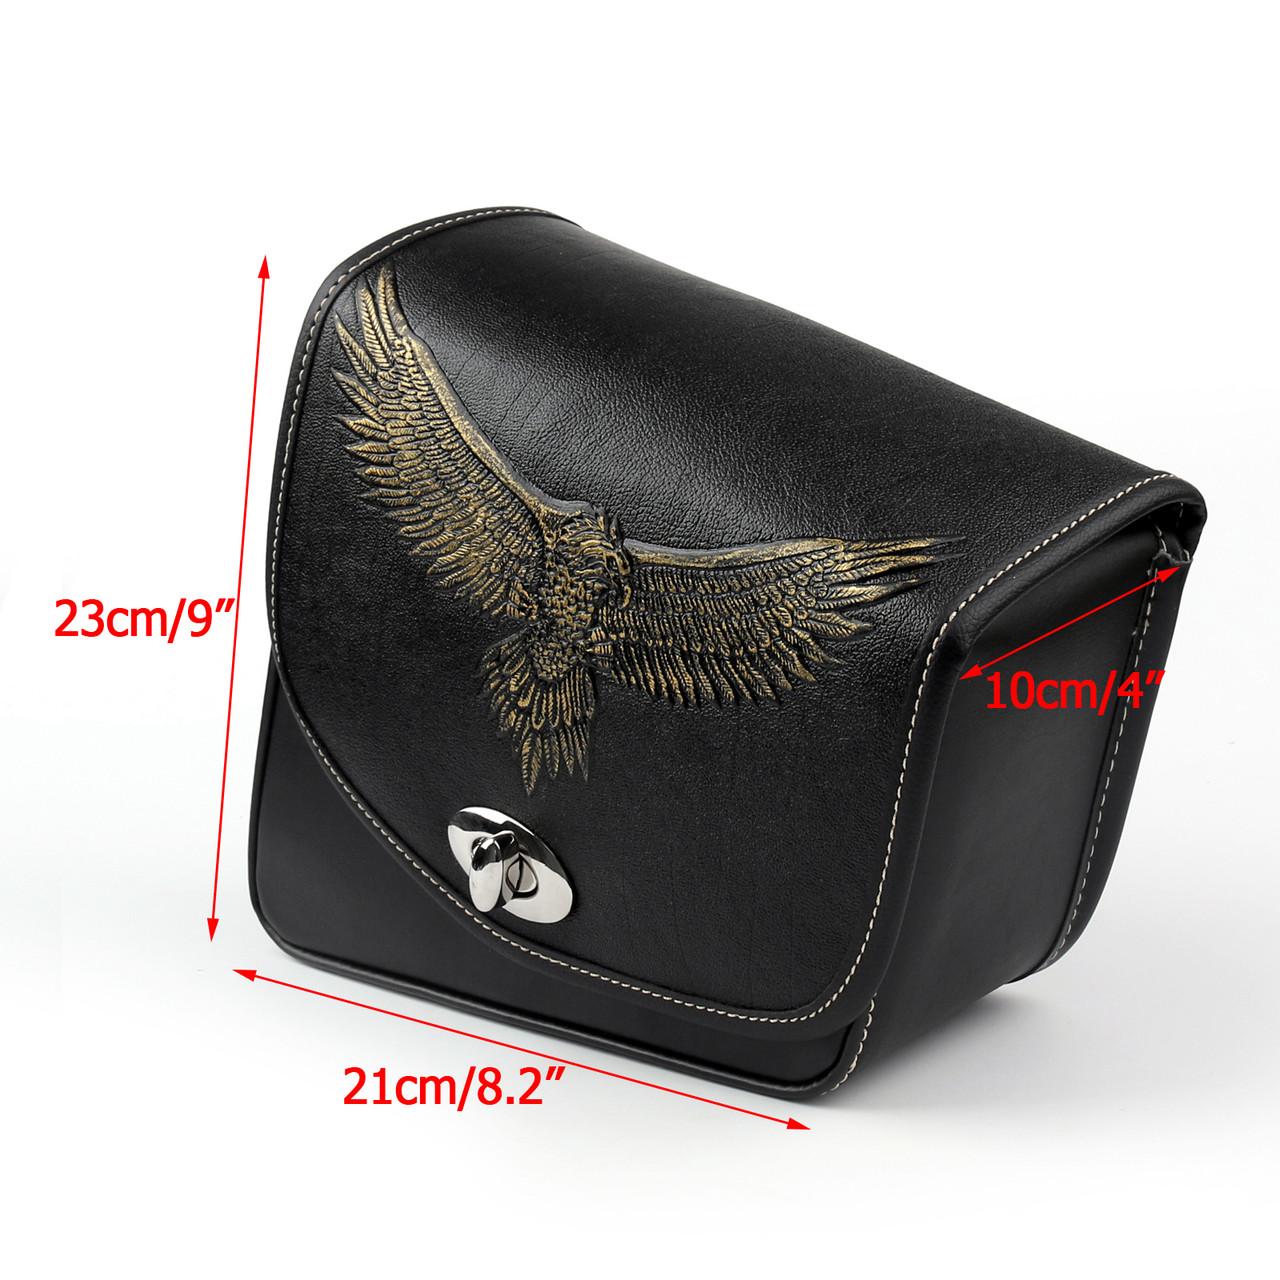 Leather Right side Saddlebag Saddle Bag For Sportster XL 883 XL 1200